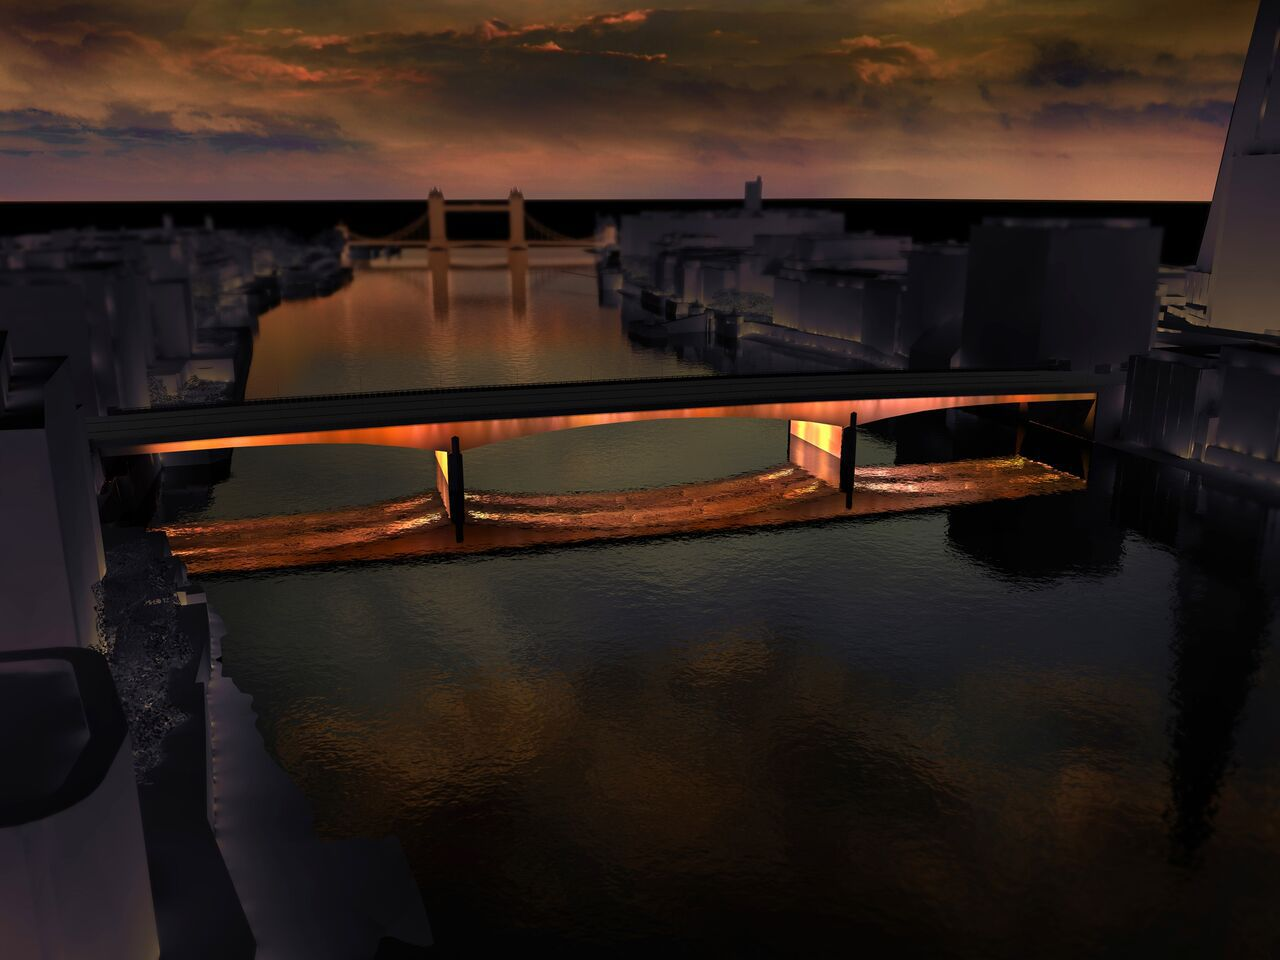 London Bridge, Londres, UK © MRC and Leo Villareal and Lifschutz Davidson Sandilands